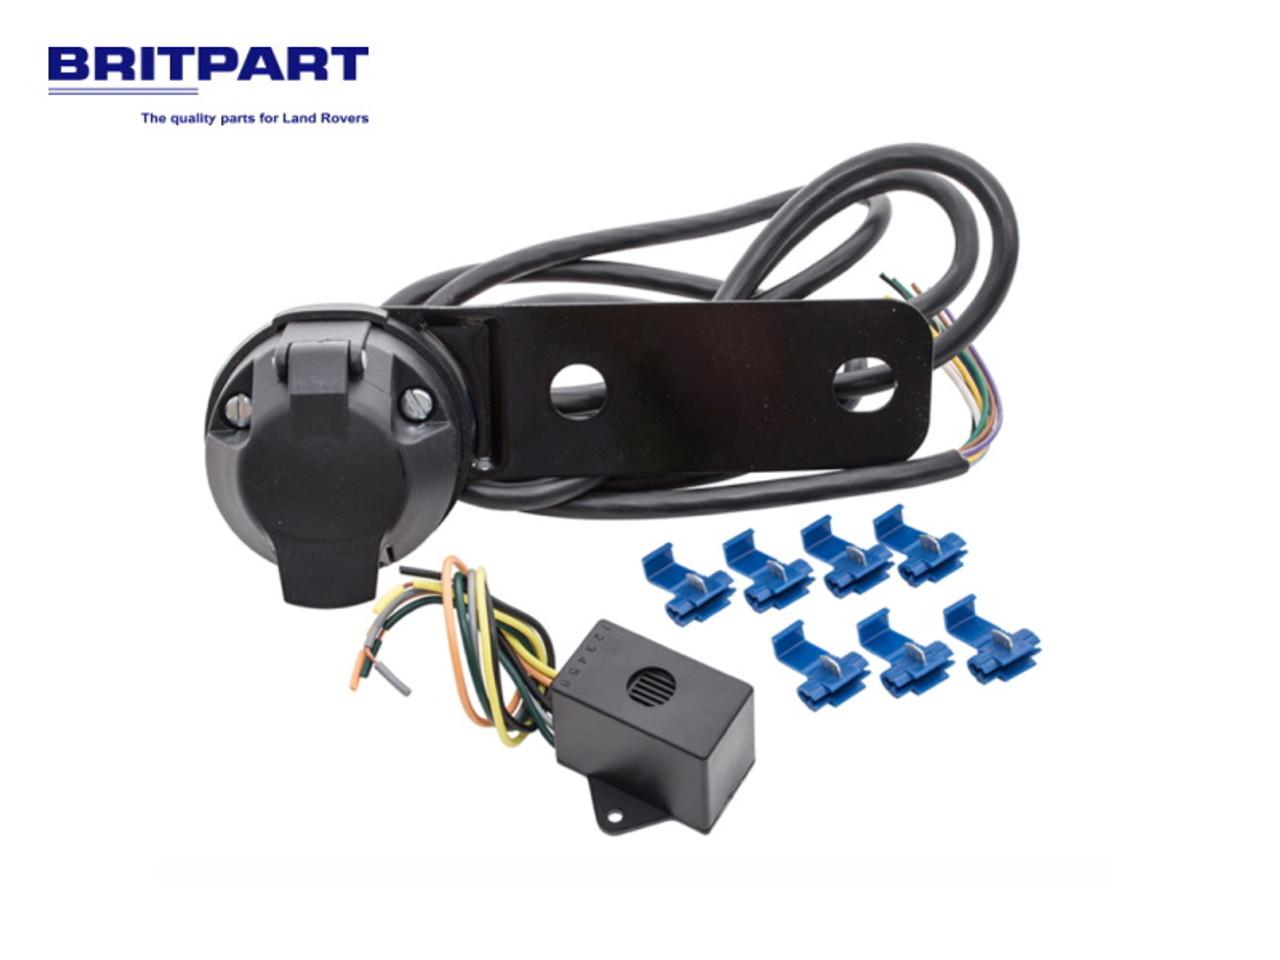 Britpart 7 Pin Universal Socket Assembly  - RTC8872